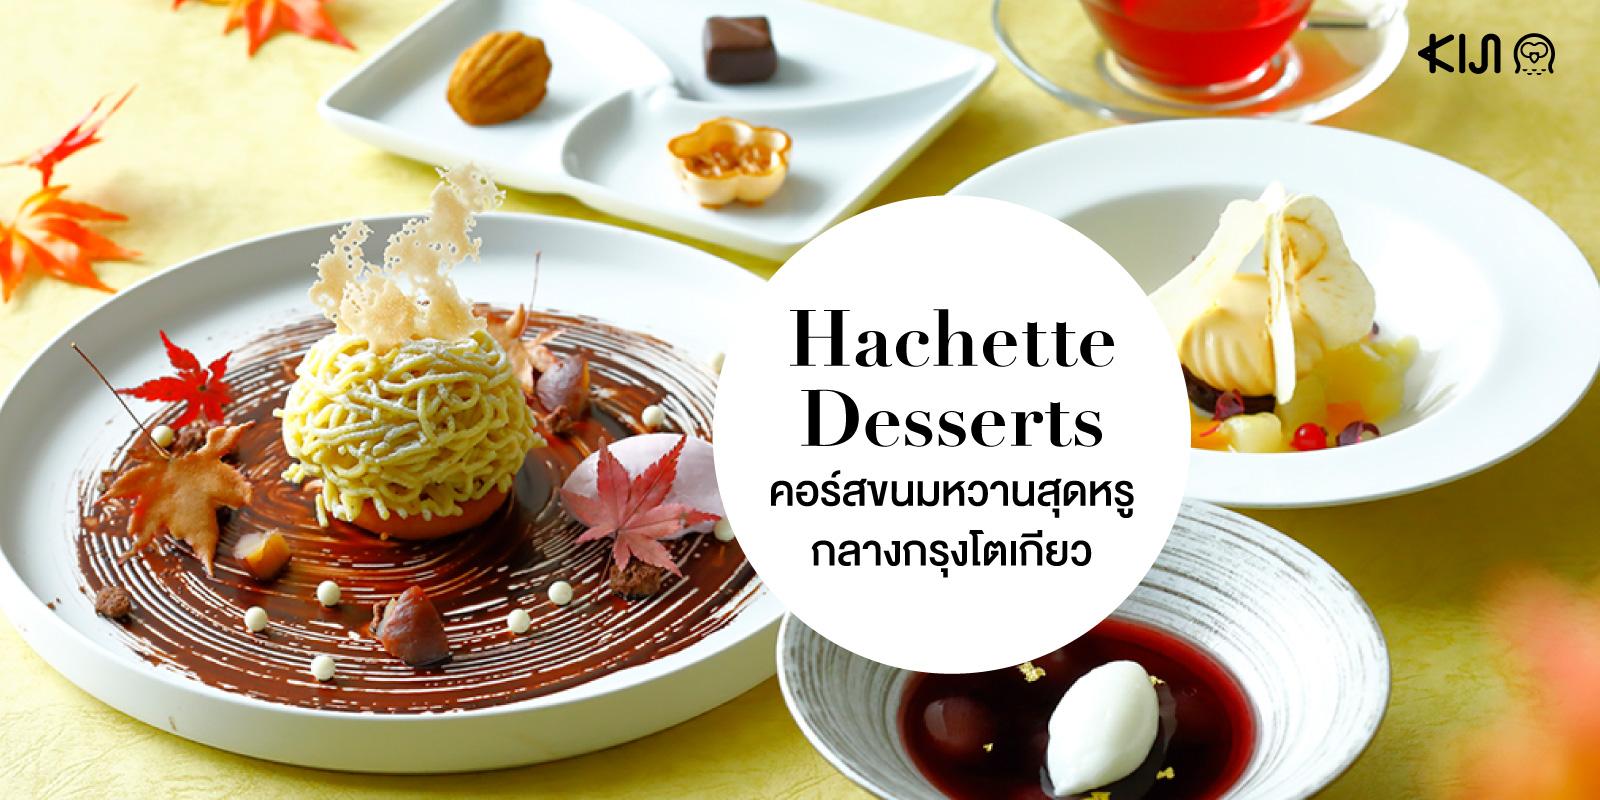 Hachette Desserts อร์สขนมหวานสไตล์ฝรั่งเศสต้อนรับฤดูใบไม้ร่วงน่าที่ Hotel Century Southern Tower